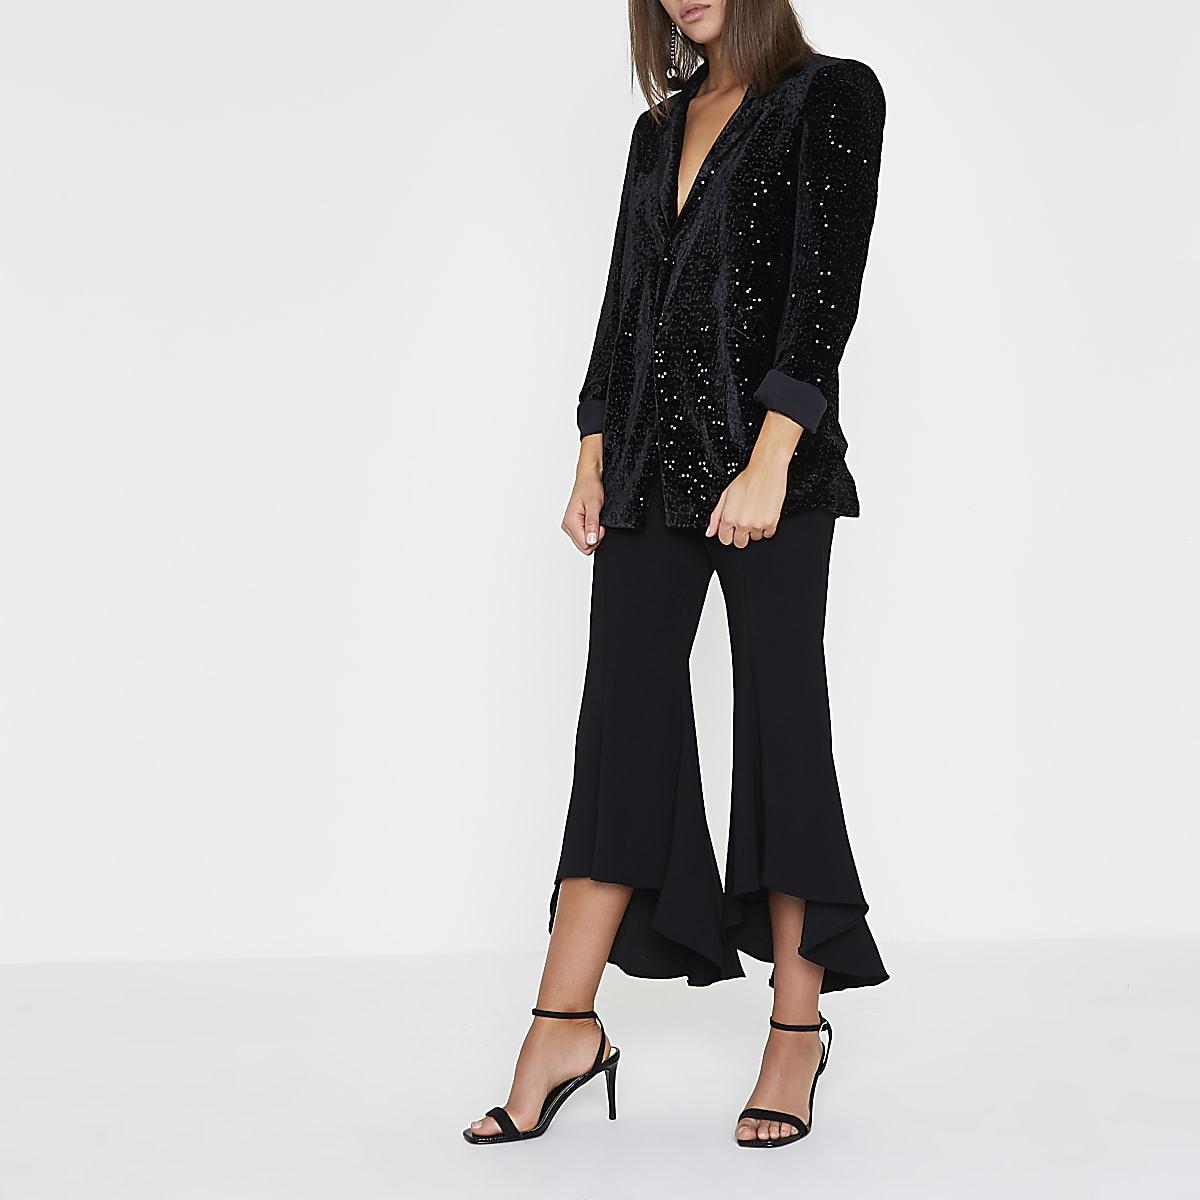 Pantalon évasé court noir